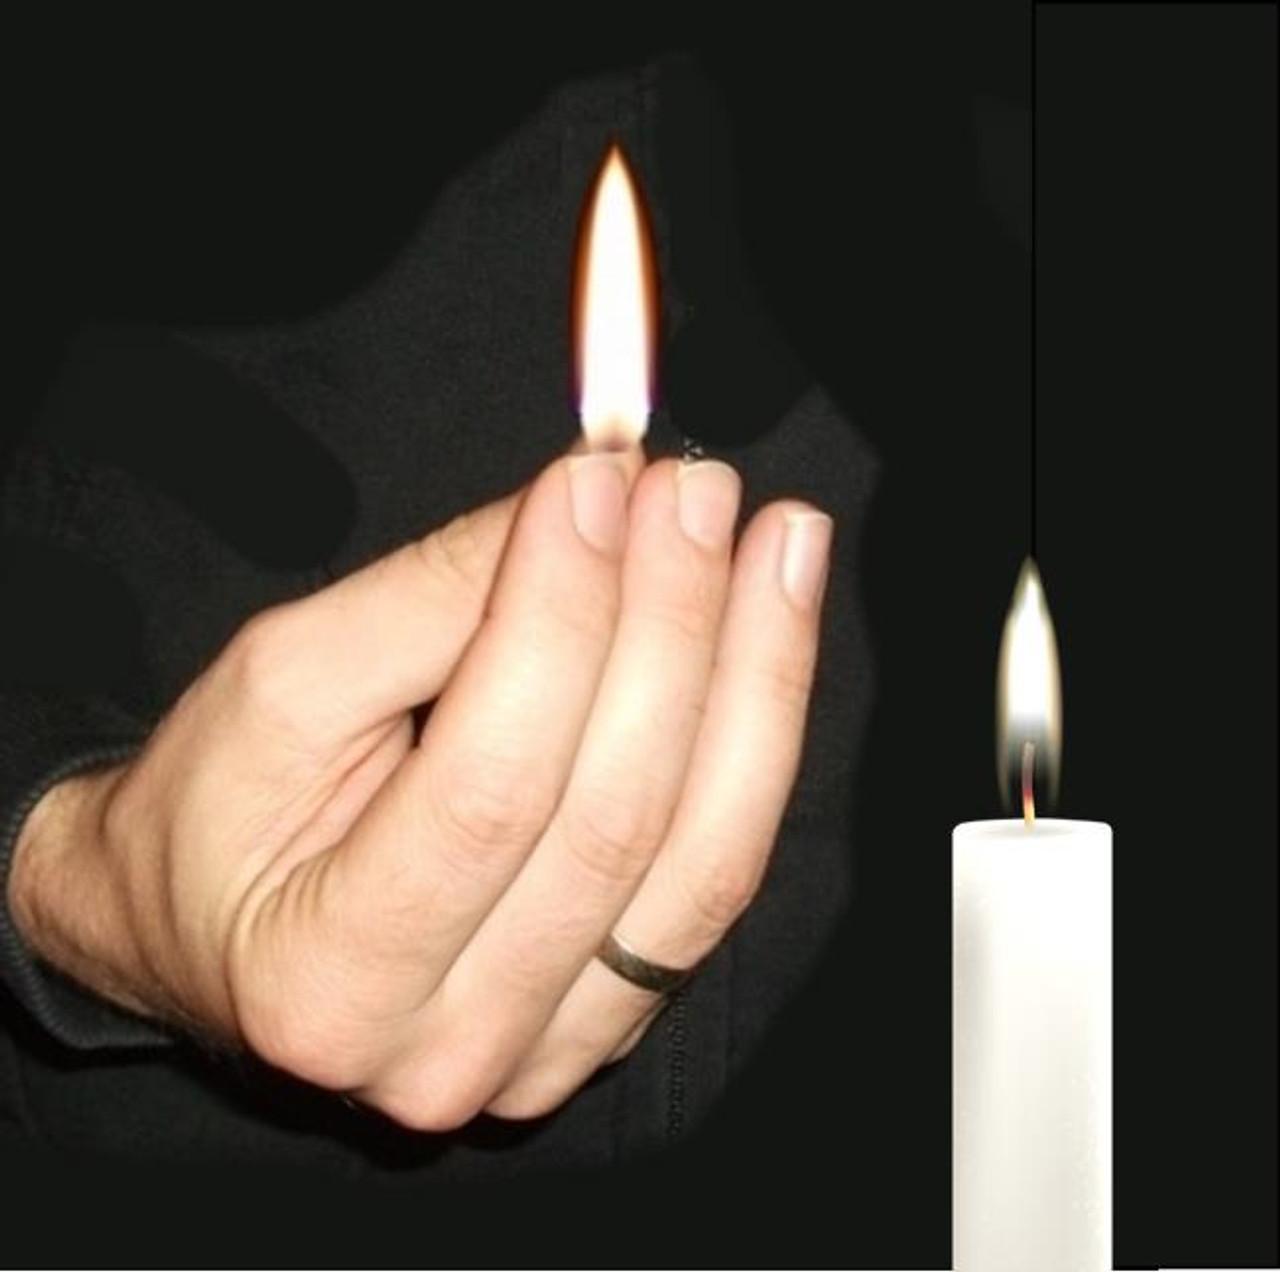 Vernet Thumb Tip Flame Magic Trick Gospel Christian